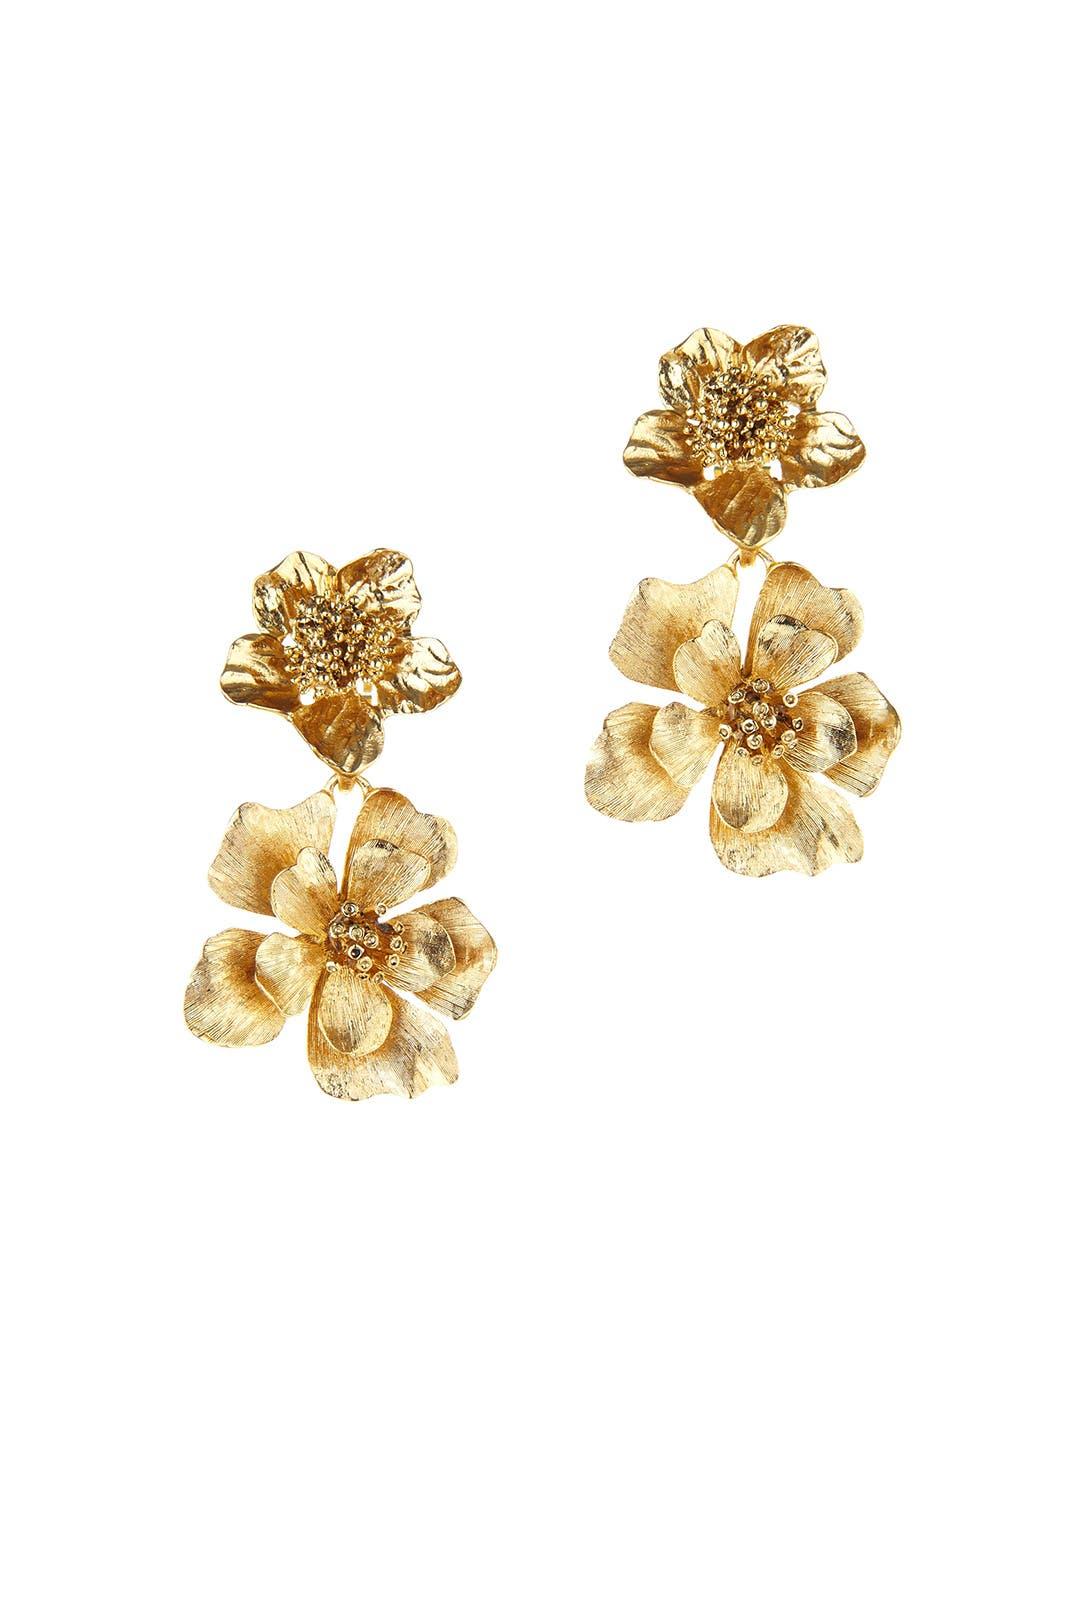 Gold Bold Flower Drop Earrings By Oscar De La Renta For. Barse Bracelet. Womens Black Wedding Rings. Teardrop Lockets. Bible Verse Necklace. Real Gold Earrings. Simple Gold Engagement Rings. Nature Necklace. Cool Rings